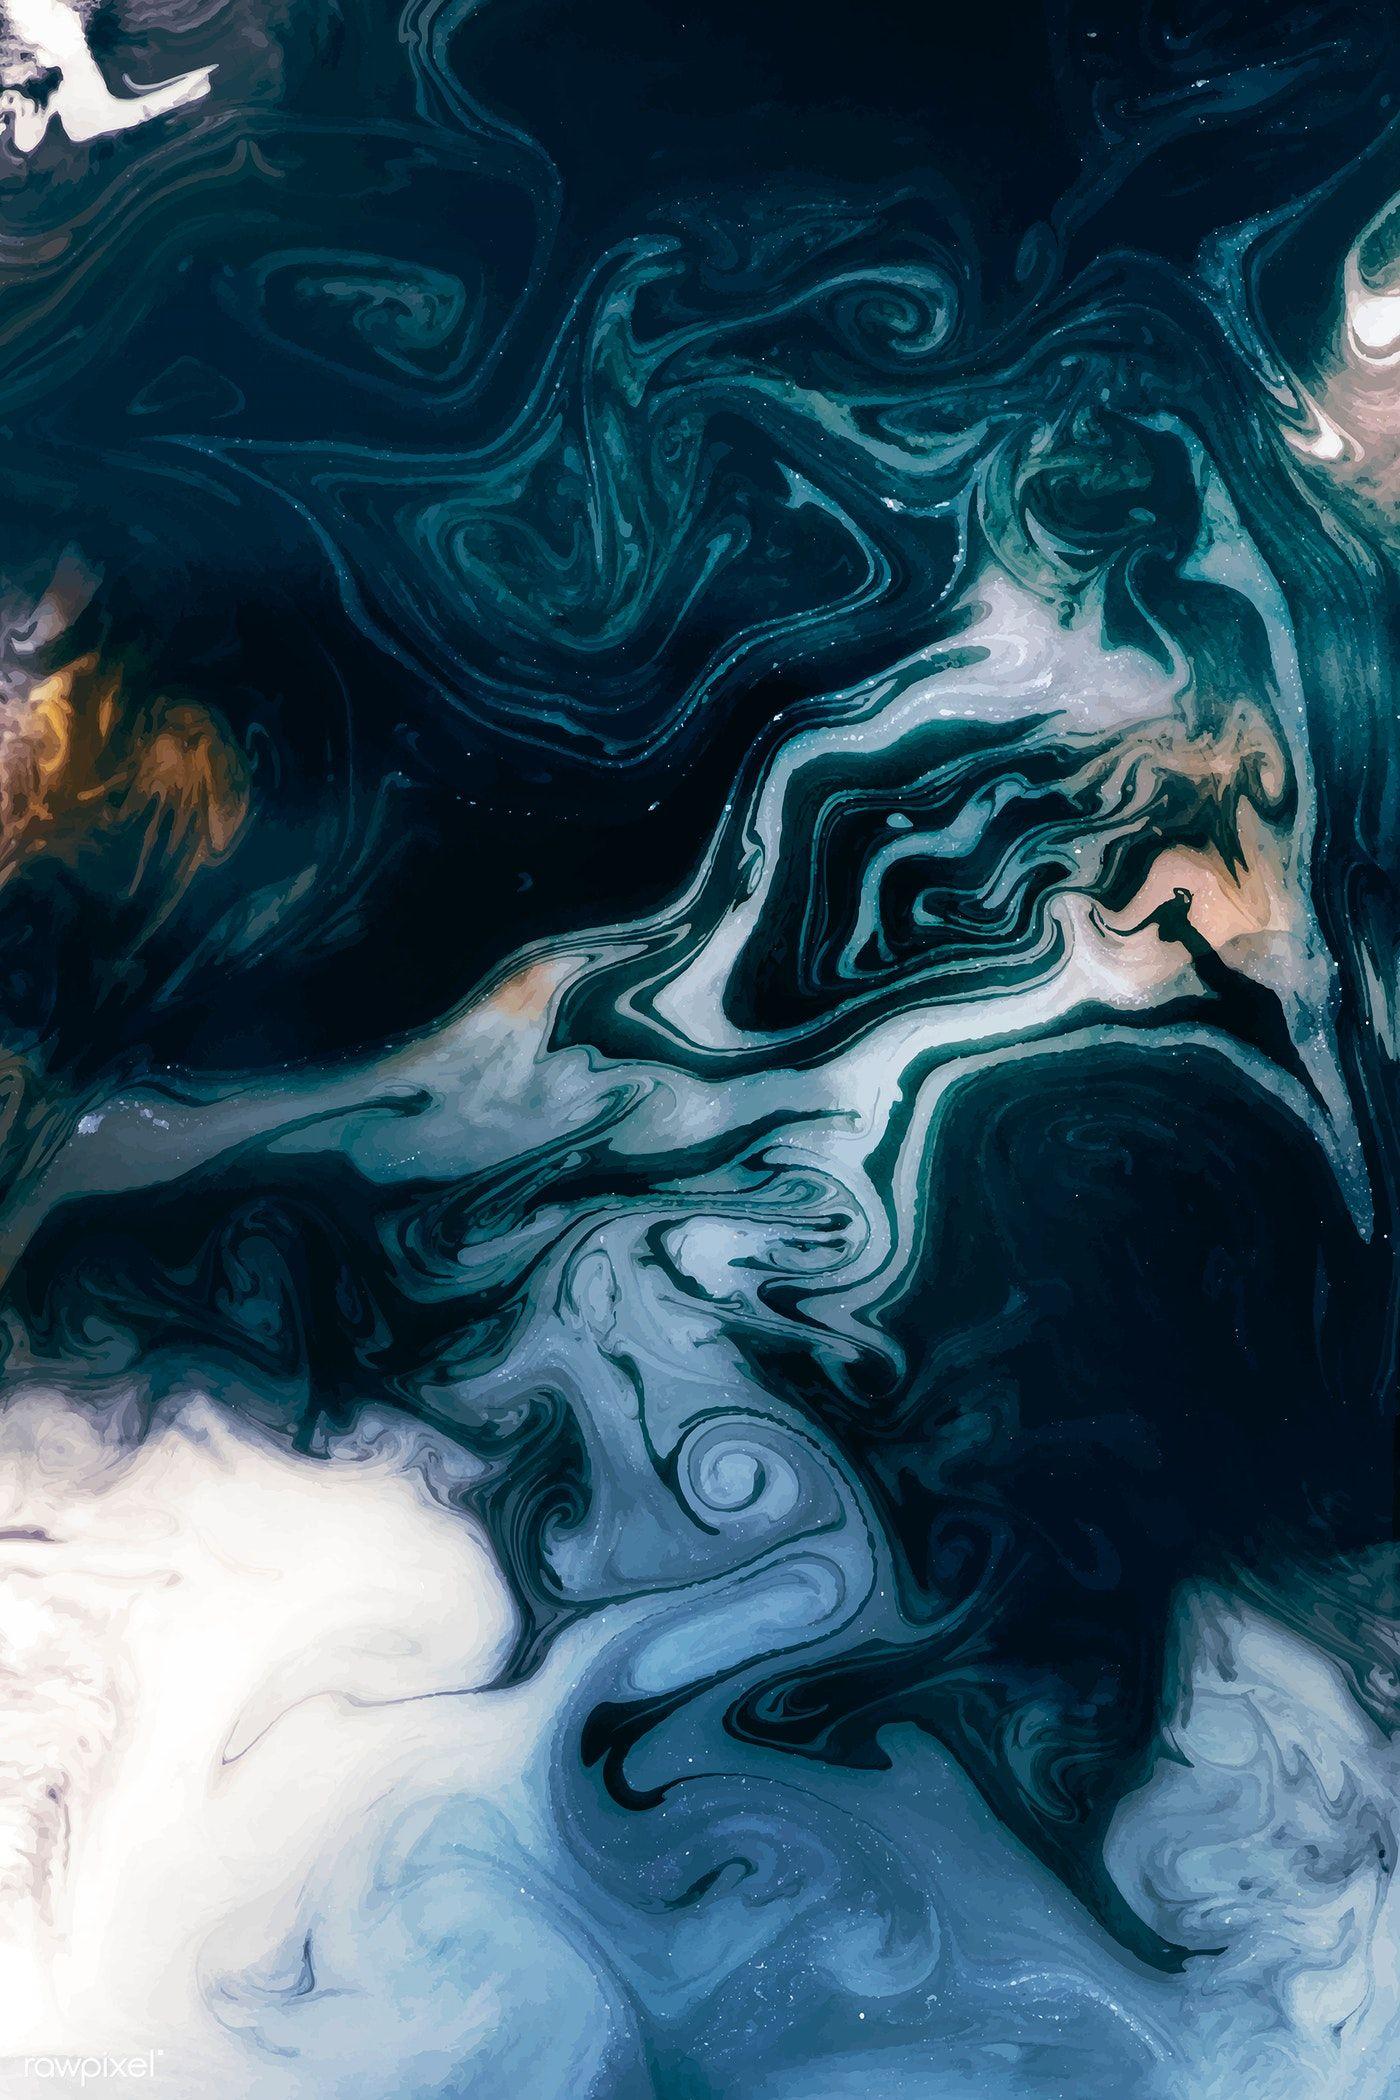 Download Premium Vector Of Abstract Blue Watercolor Design Element Vector Abstract Art Wallpaper Watercolor Pattern Background Abstract Abstract blue ink liquid paint dark